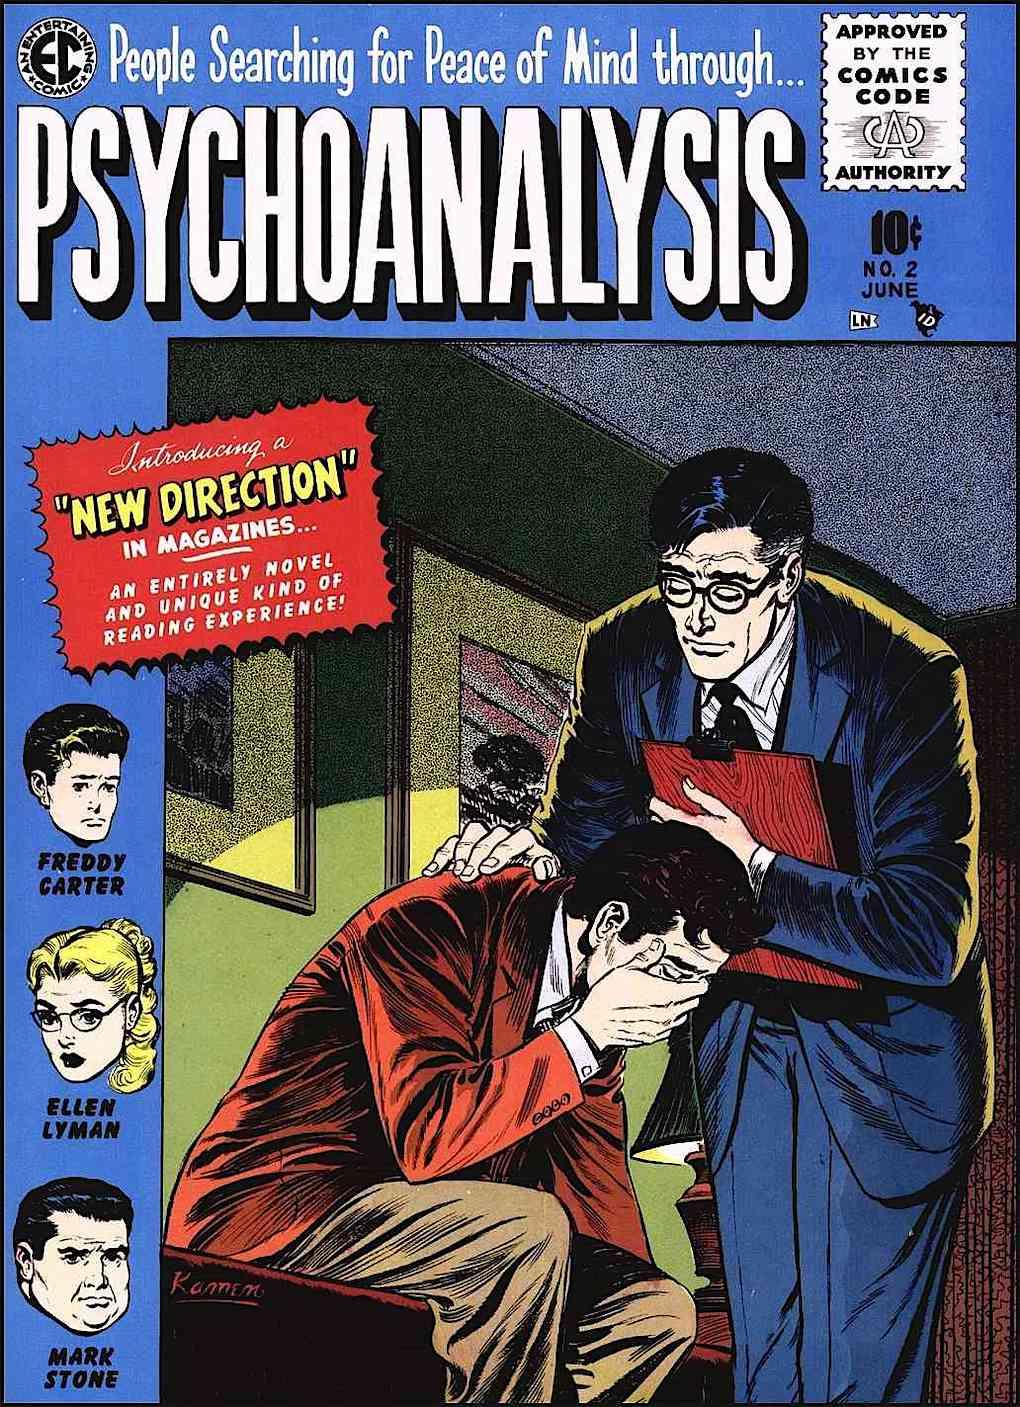 """Psychoanalysis""  a comic book for EC Comics by Jack Kamen"